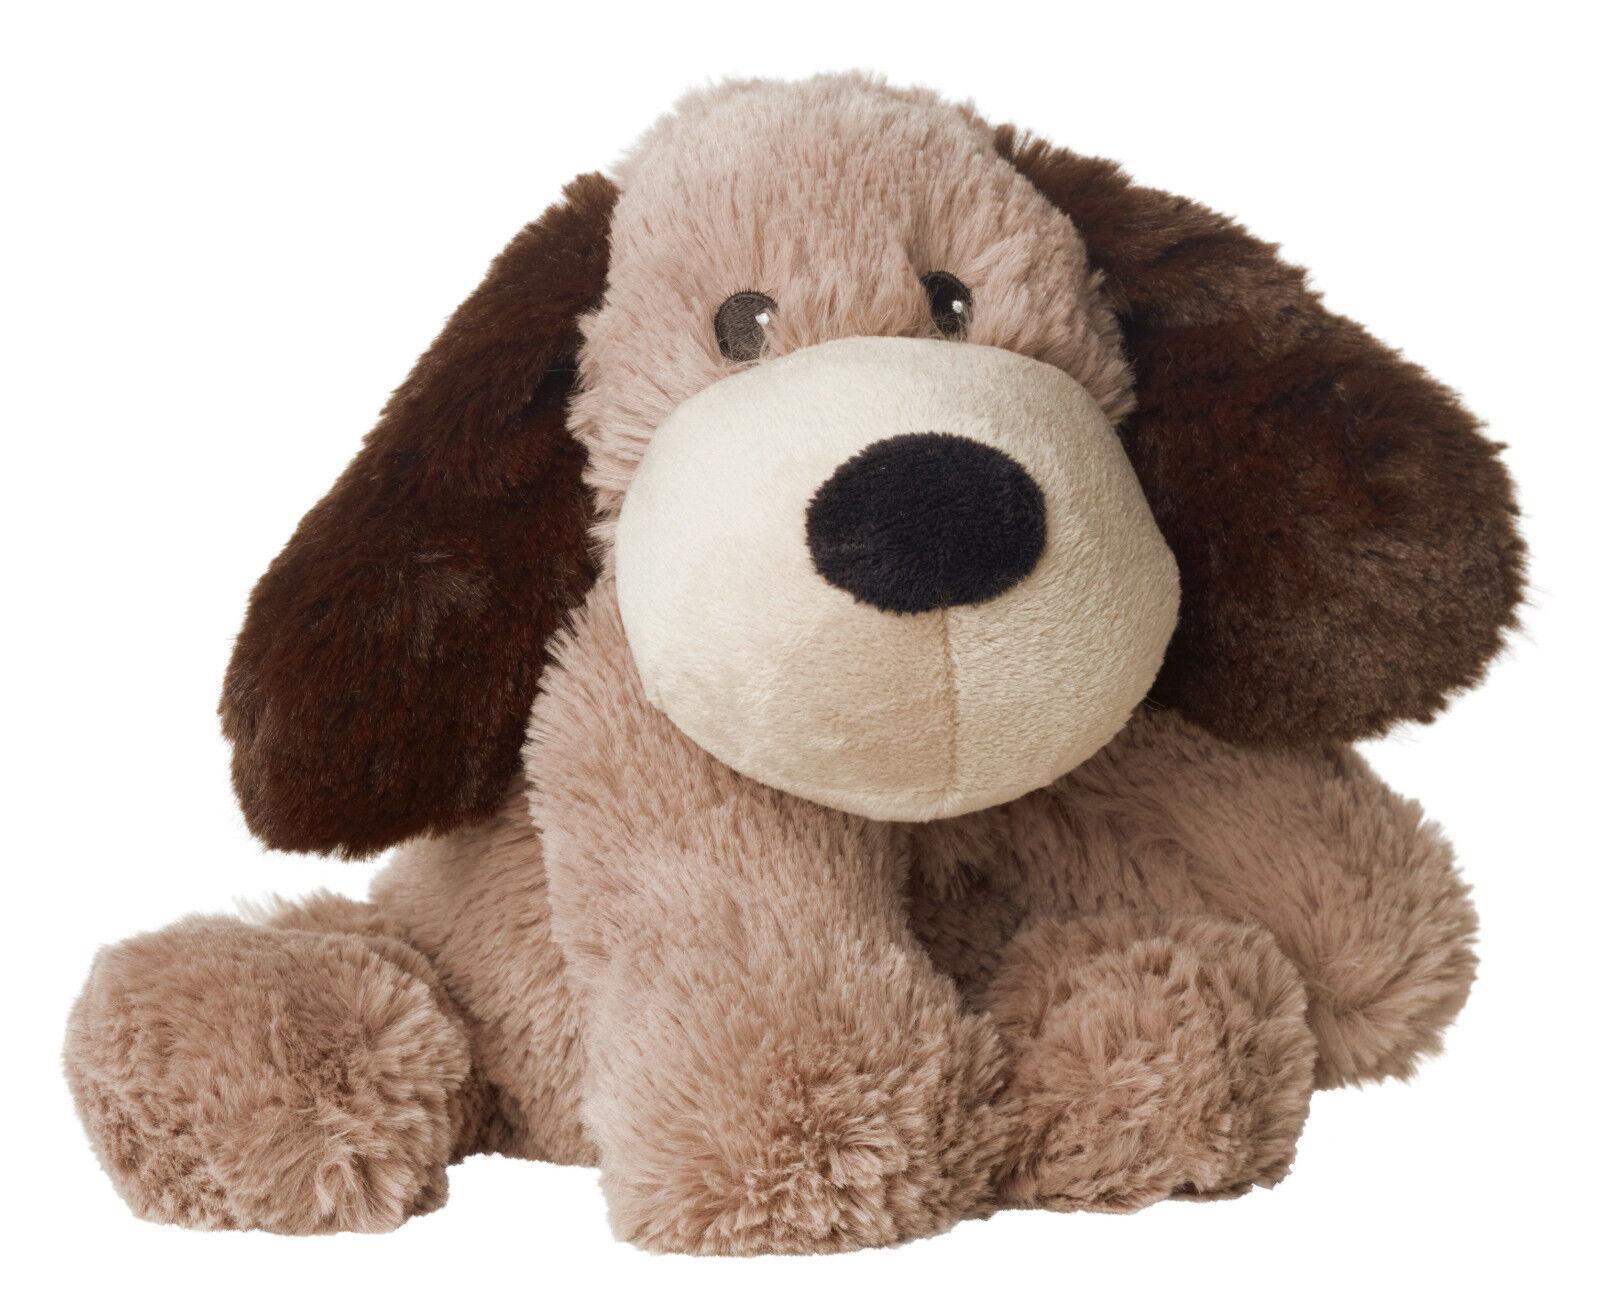 Original Warmies Greenlife Wärmestofftier Wärmekissen Körnerkissen Wärmetier NEU Hund Gary II